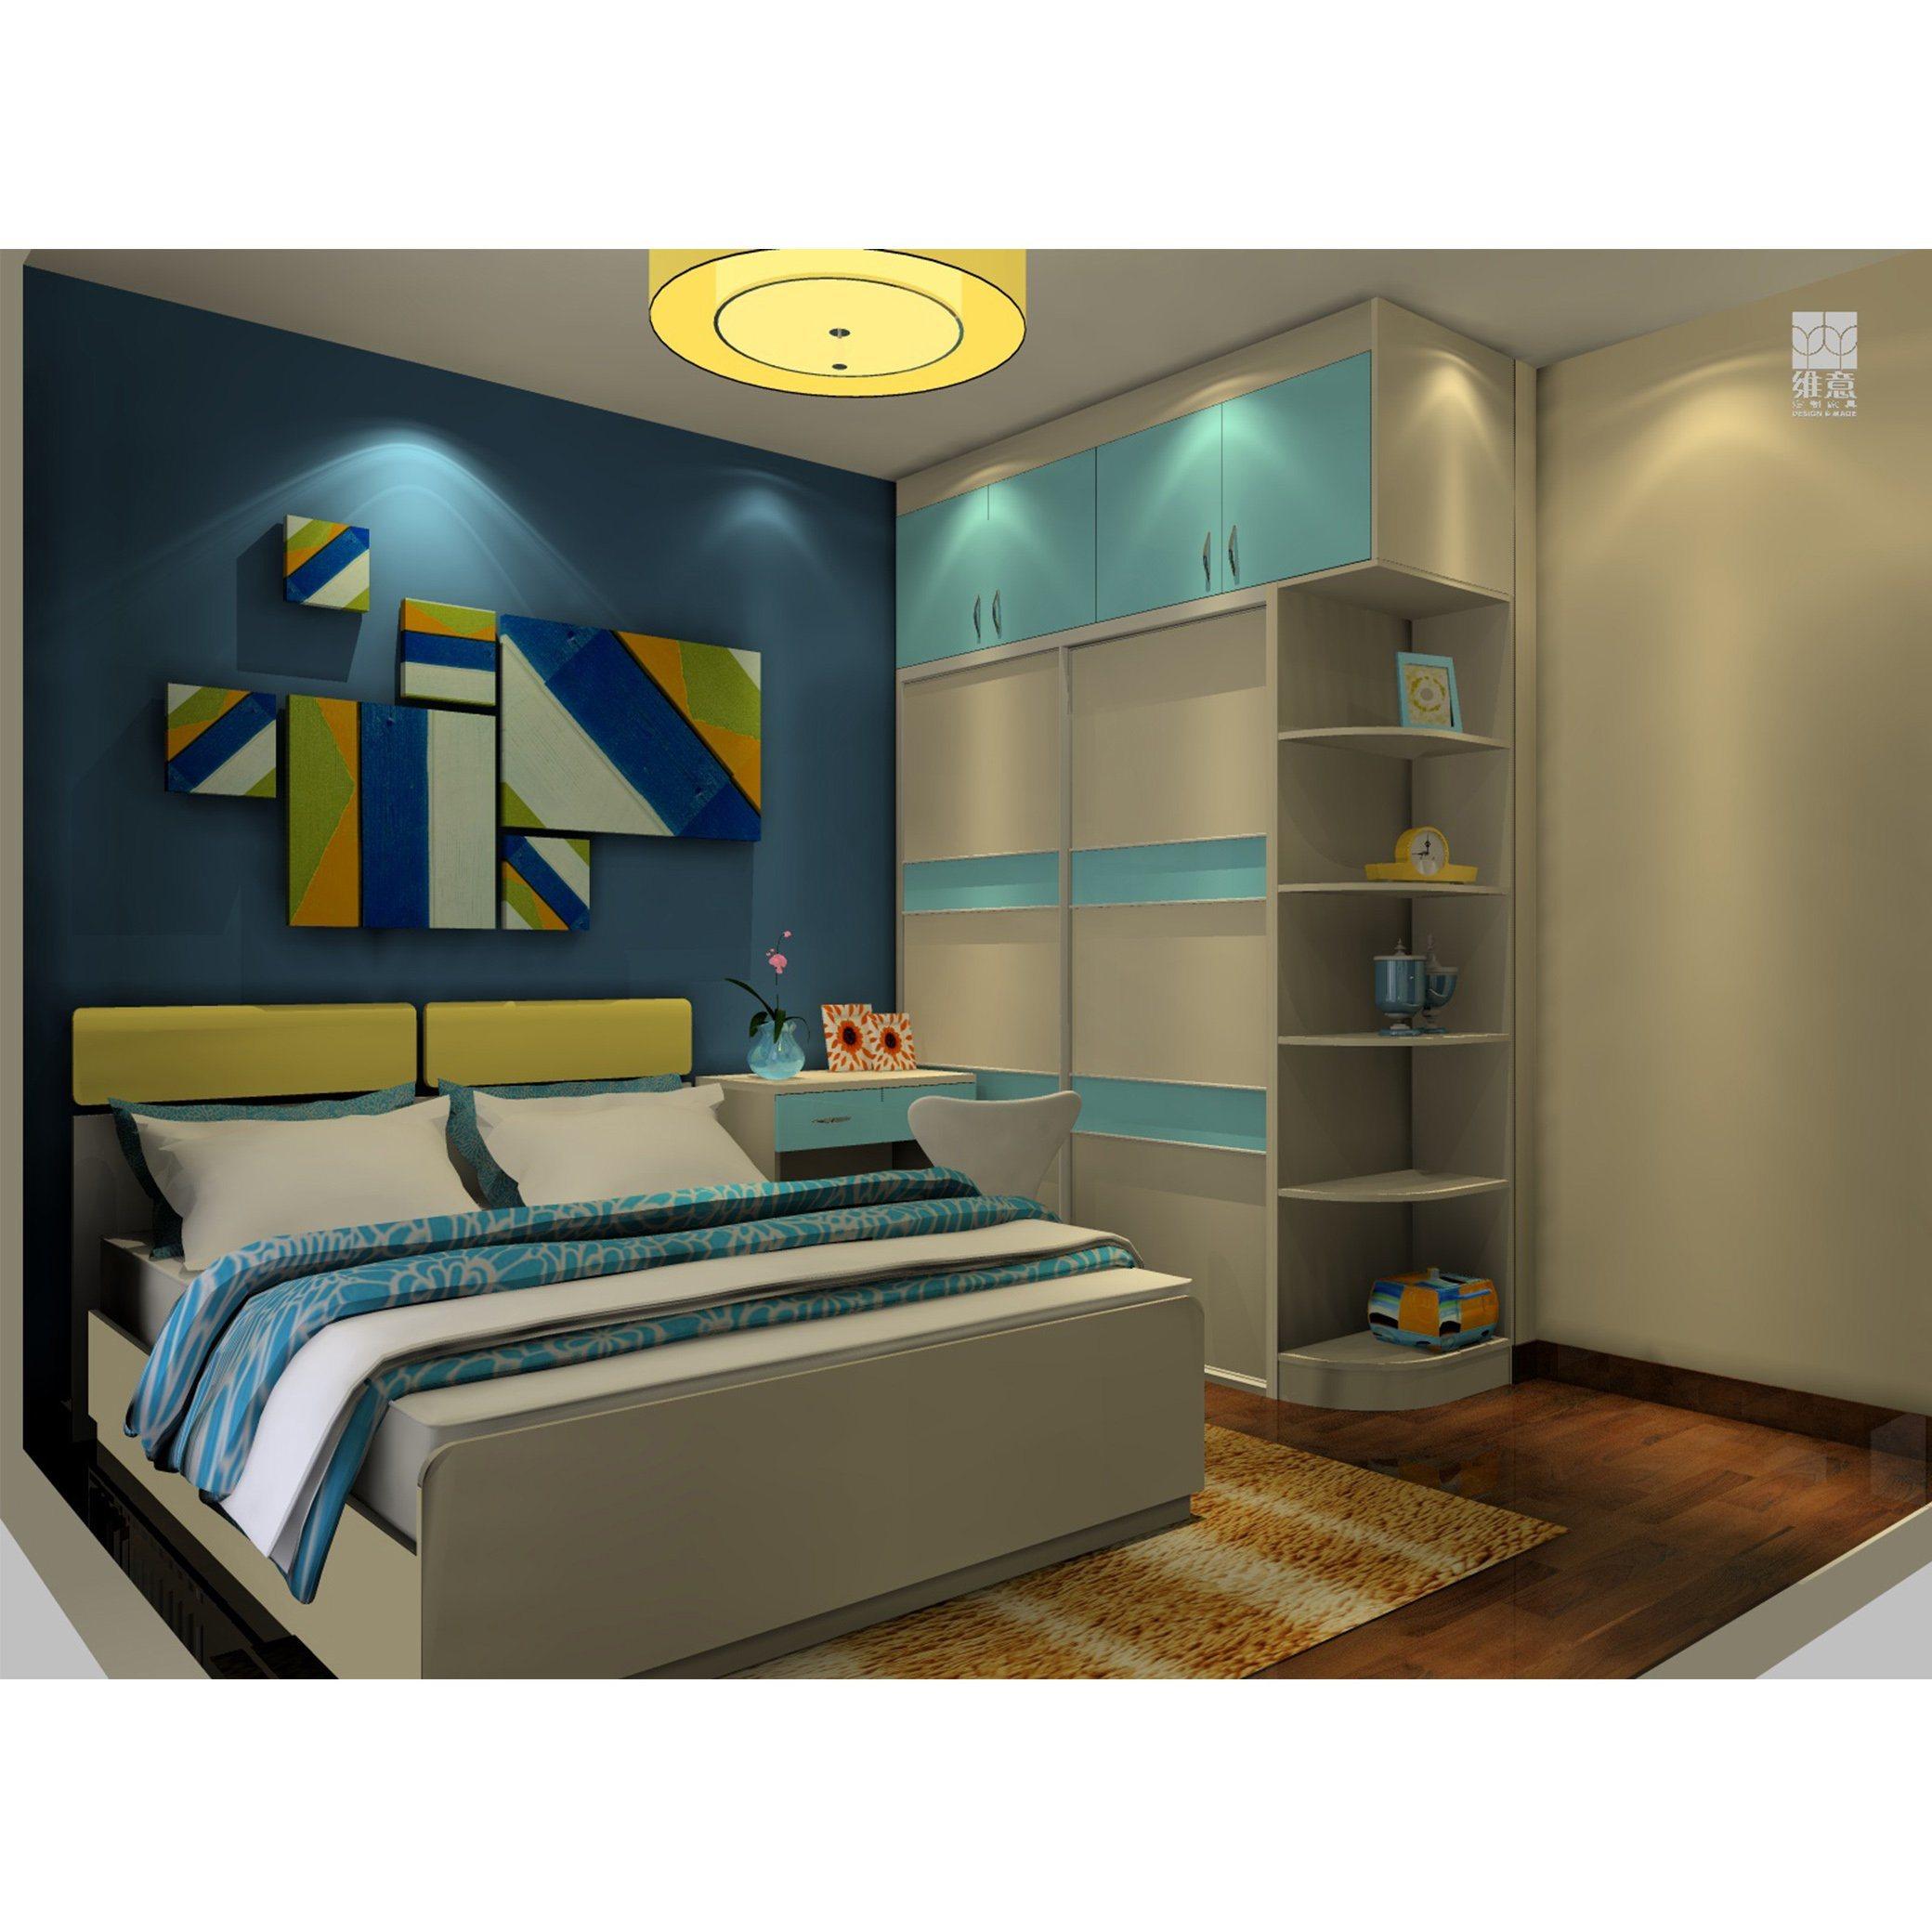 Home Design White and Blue Lacquer Partical Board Sliding Wardrobe